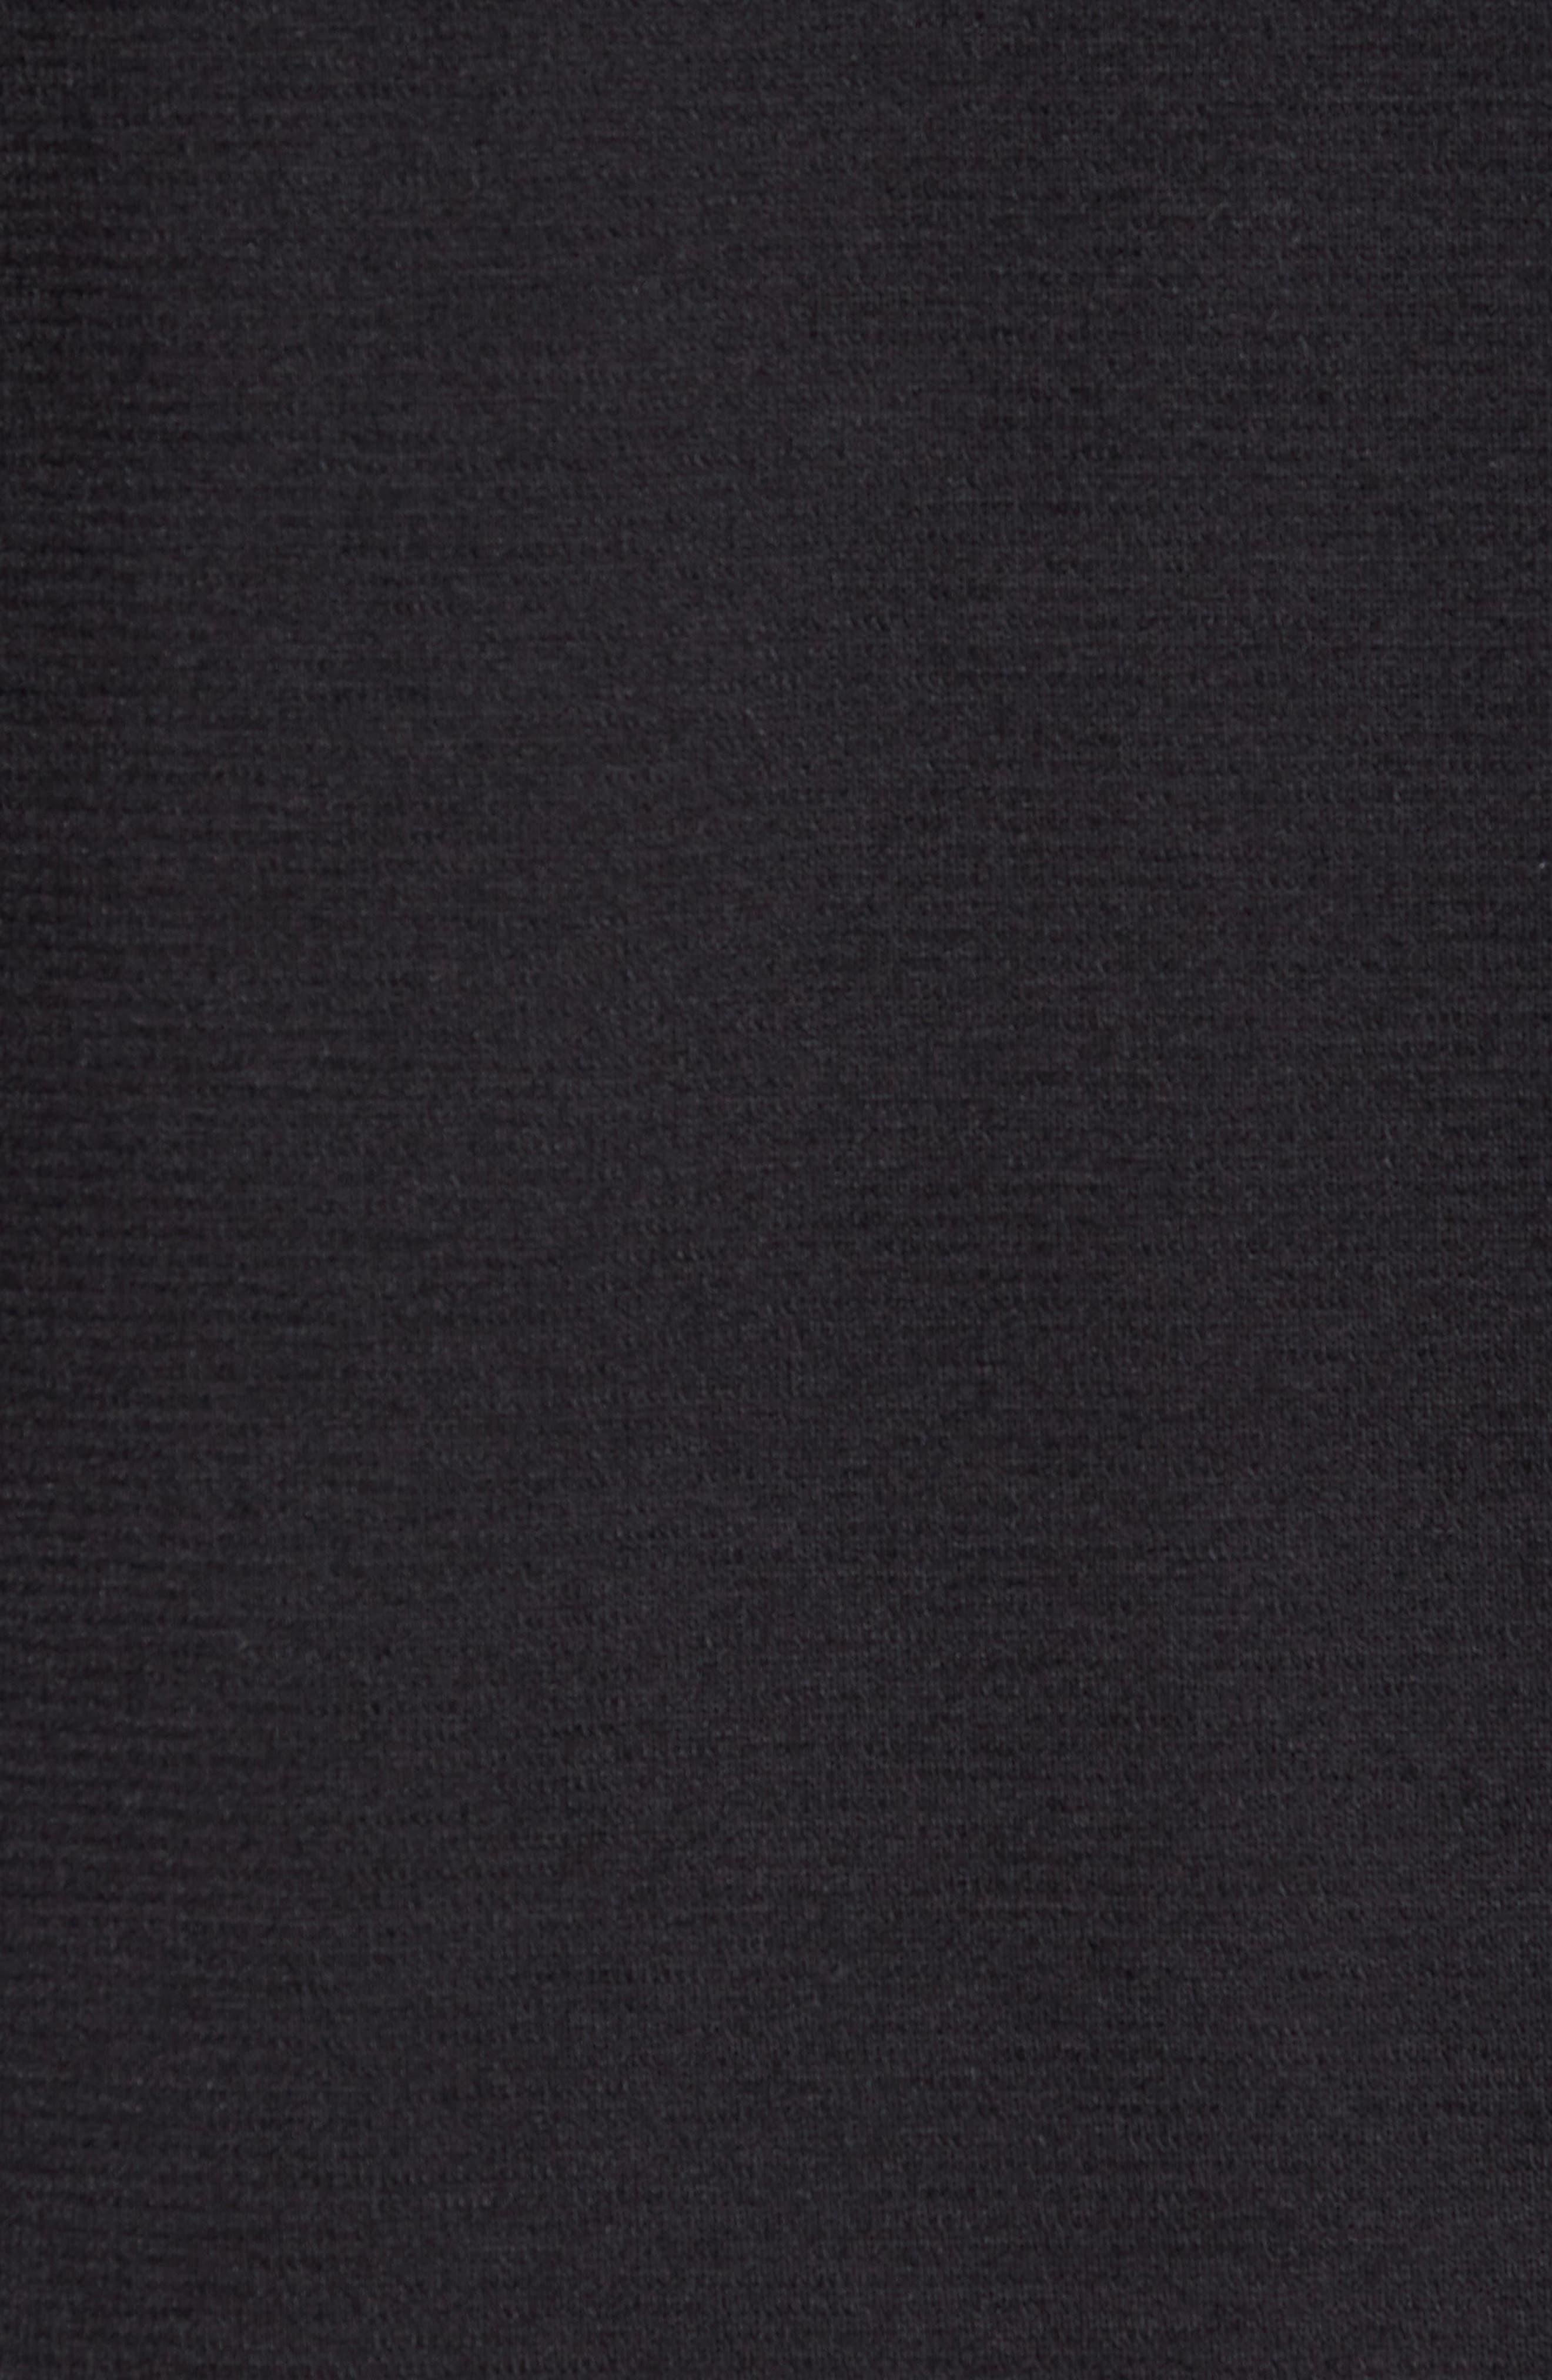 Crewneck Sweater,                             Alternate thumbnail 6, color,                             BLACK CAVIAR